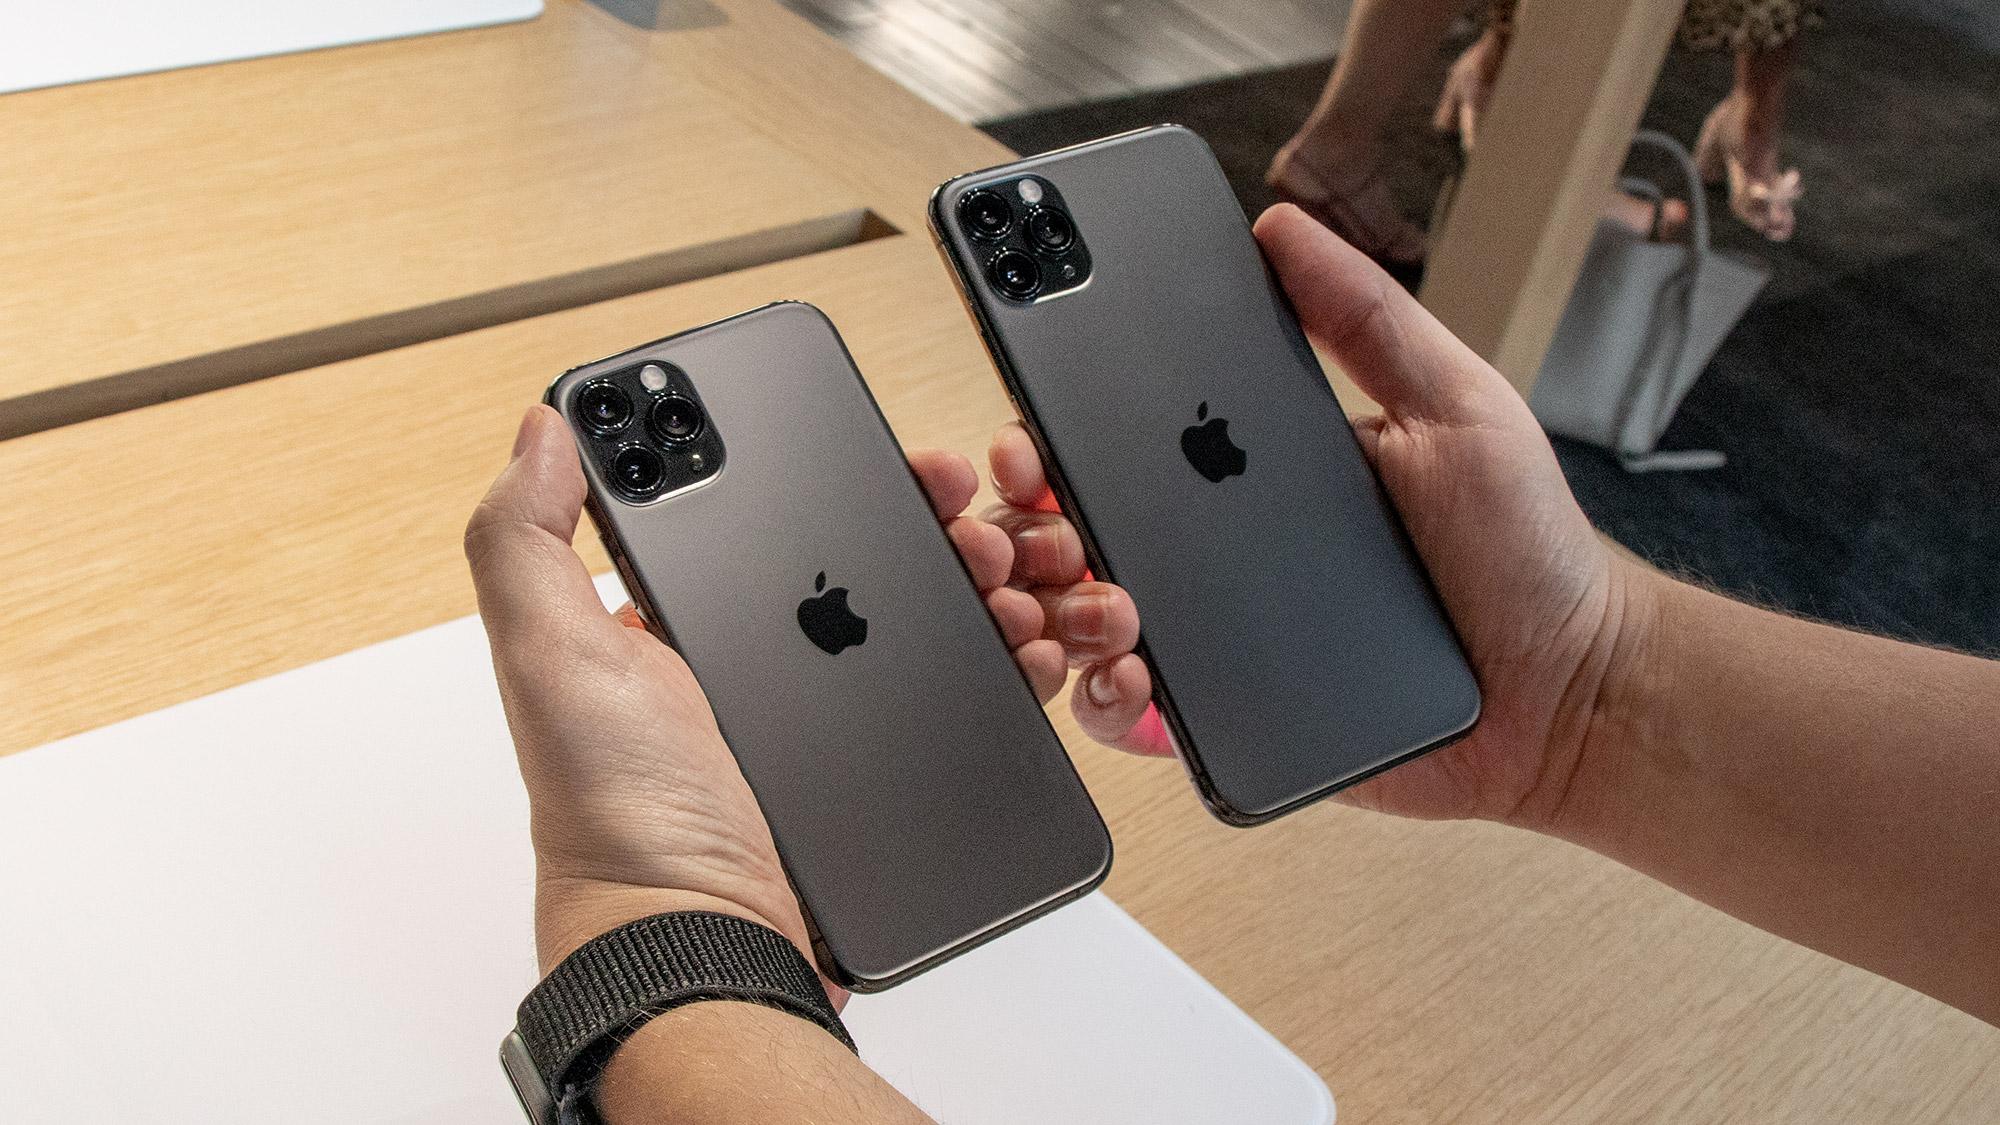 Is it better to speak or die? iPhone 11 case